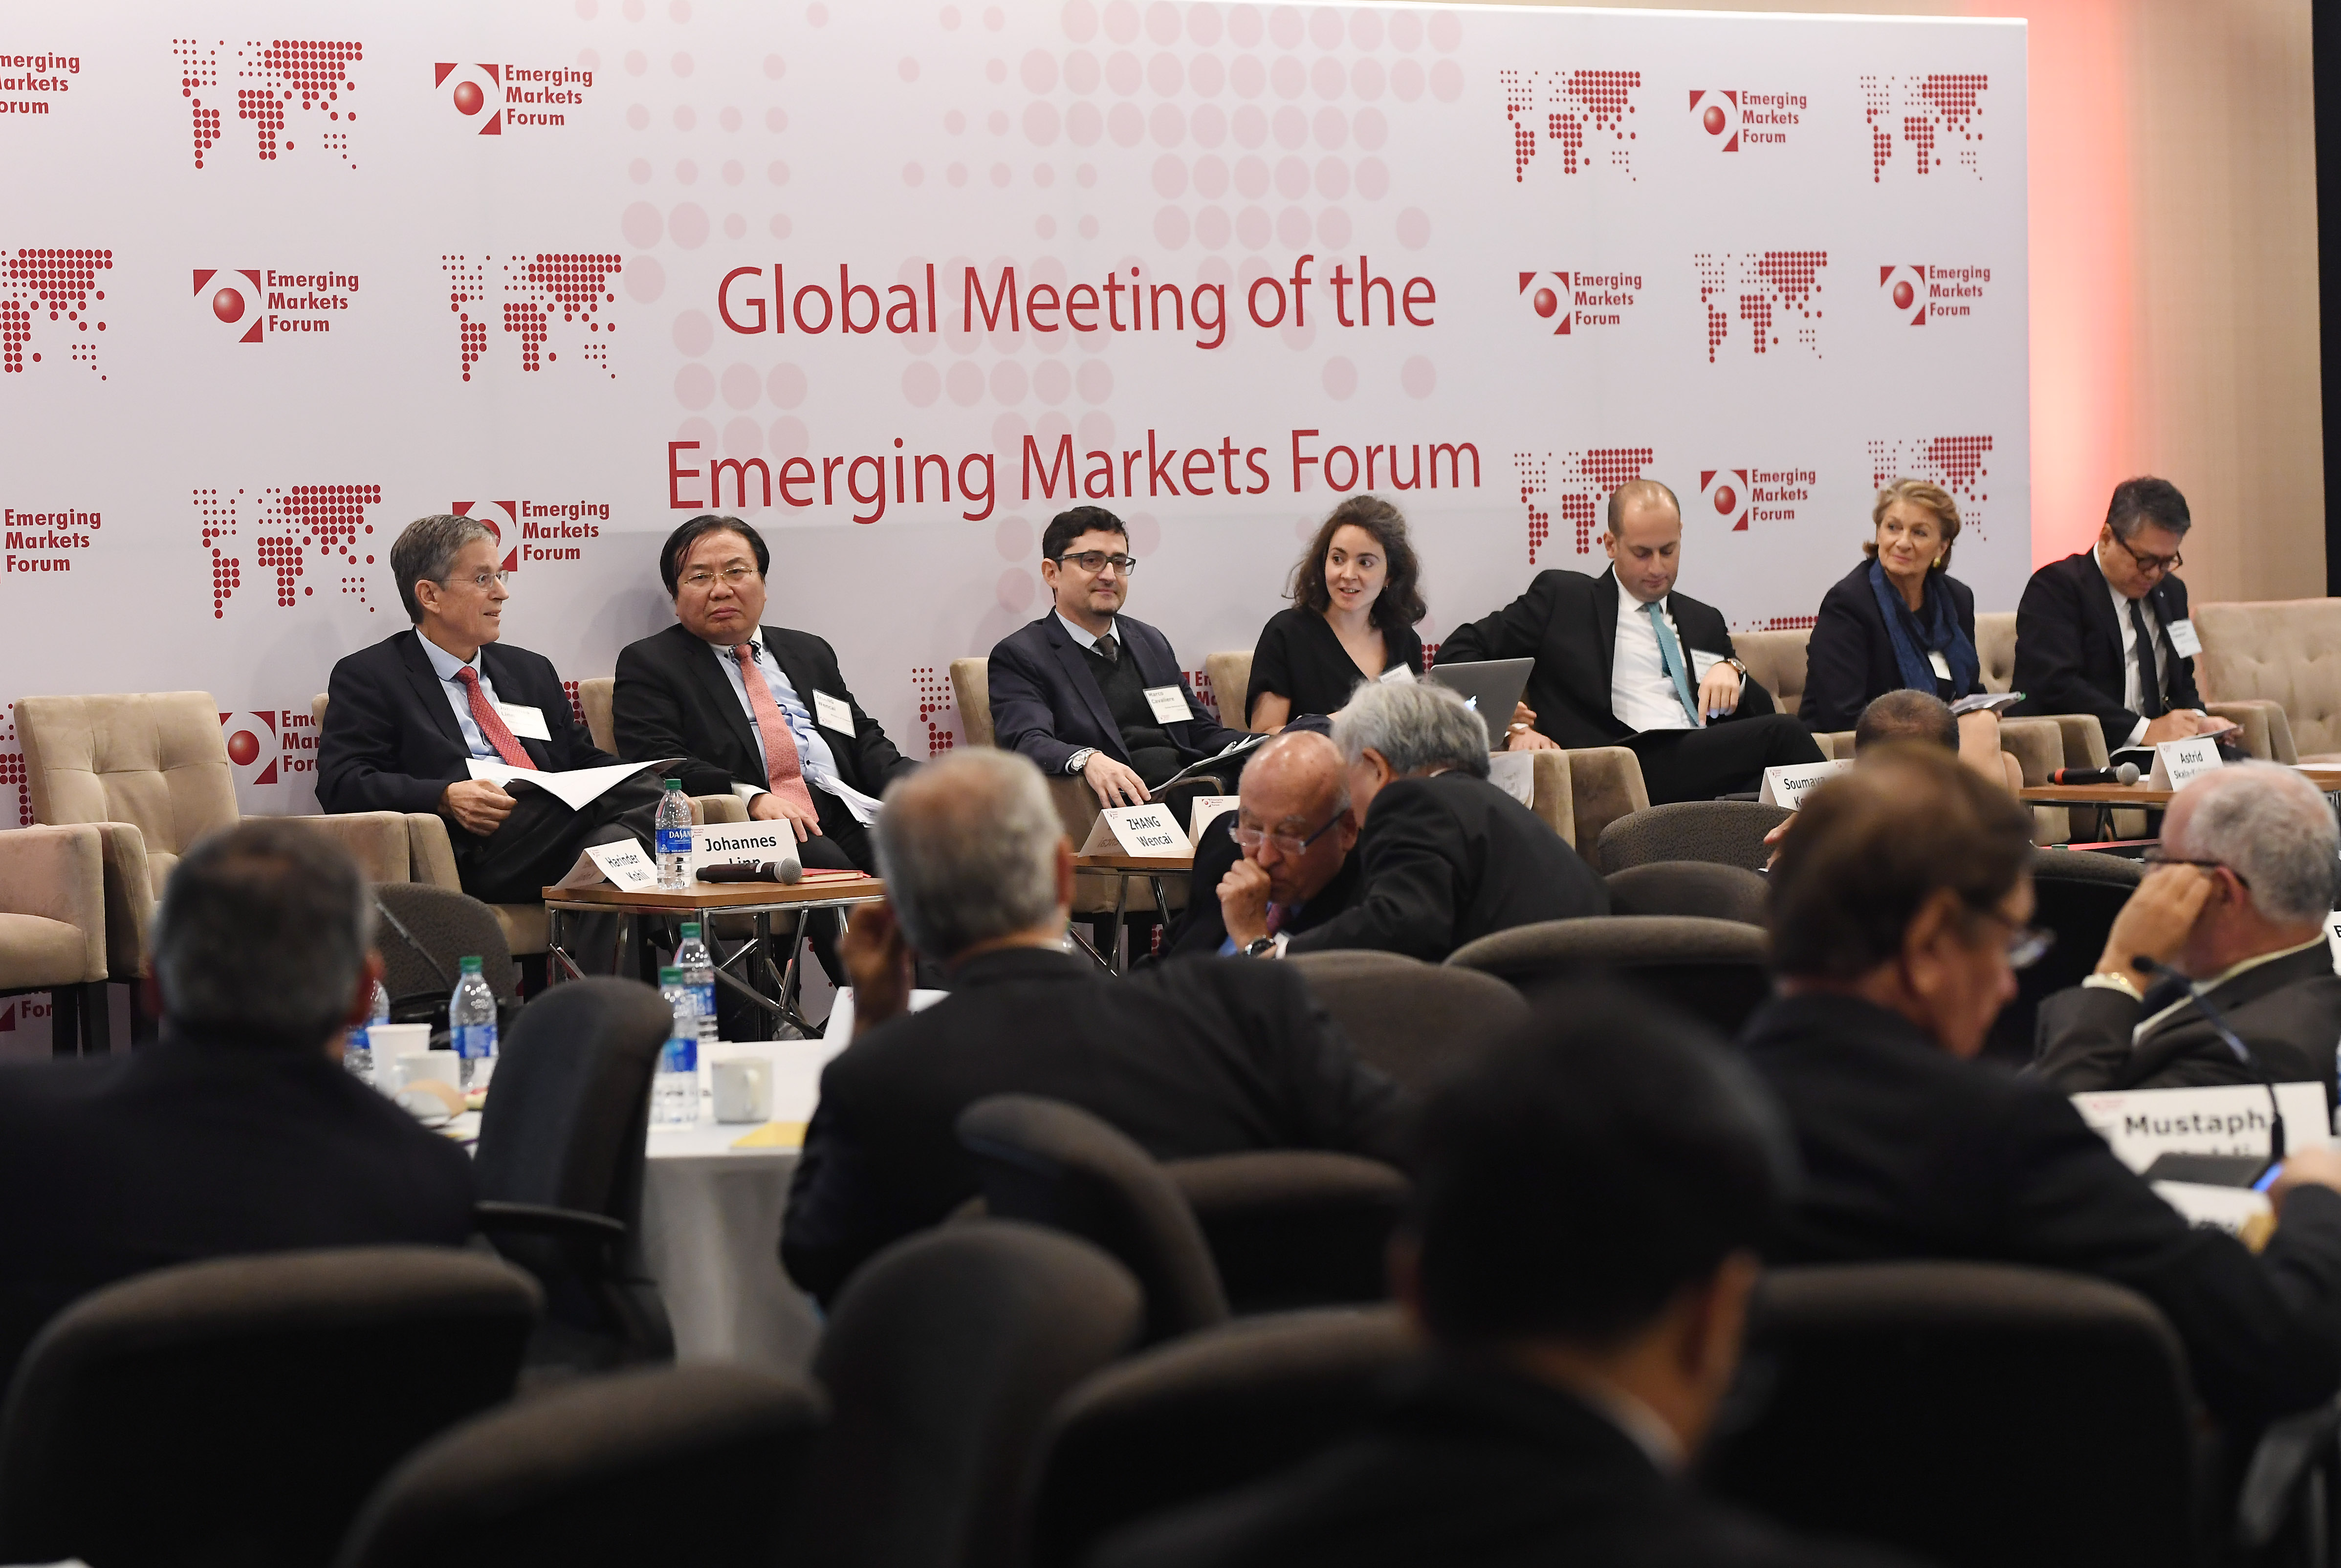 Xinhua Headlines: BRI wins applause for driving growth among emerging markets - Xinhua | English.news.cn